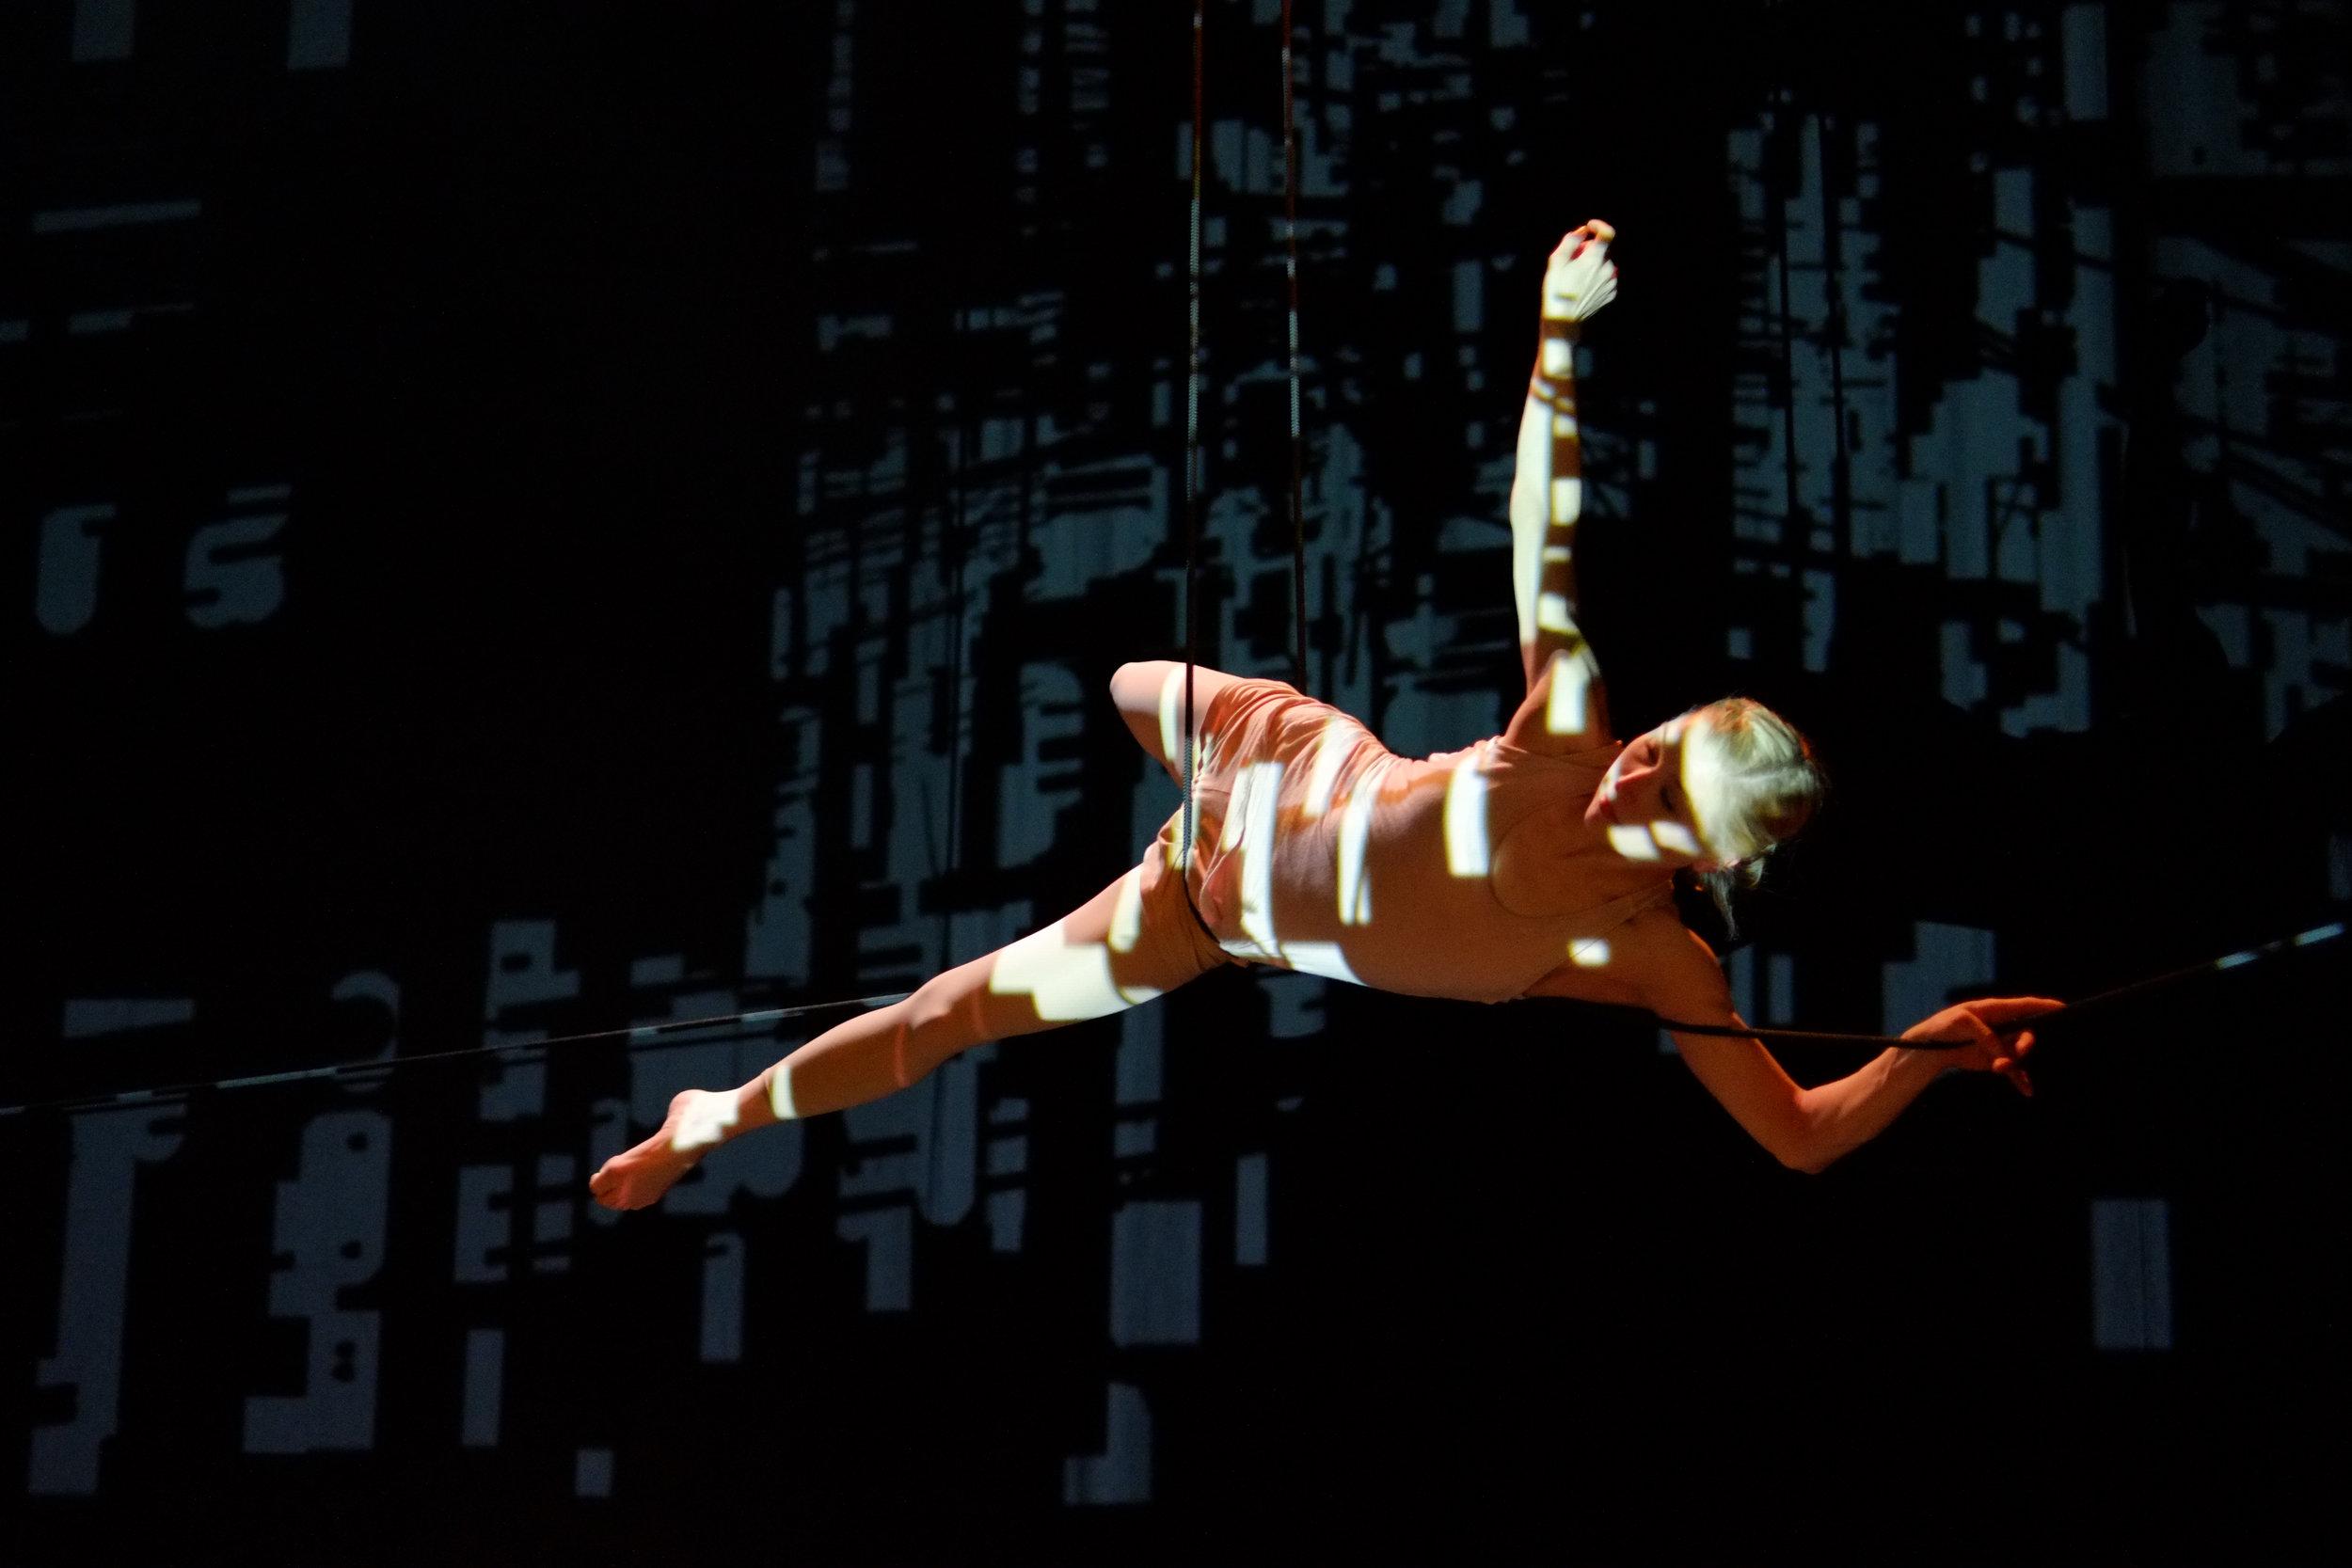 Architect Tuula Jeker creates site-specific performances with aerial artist Ilona Jäntti.